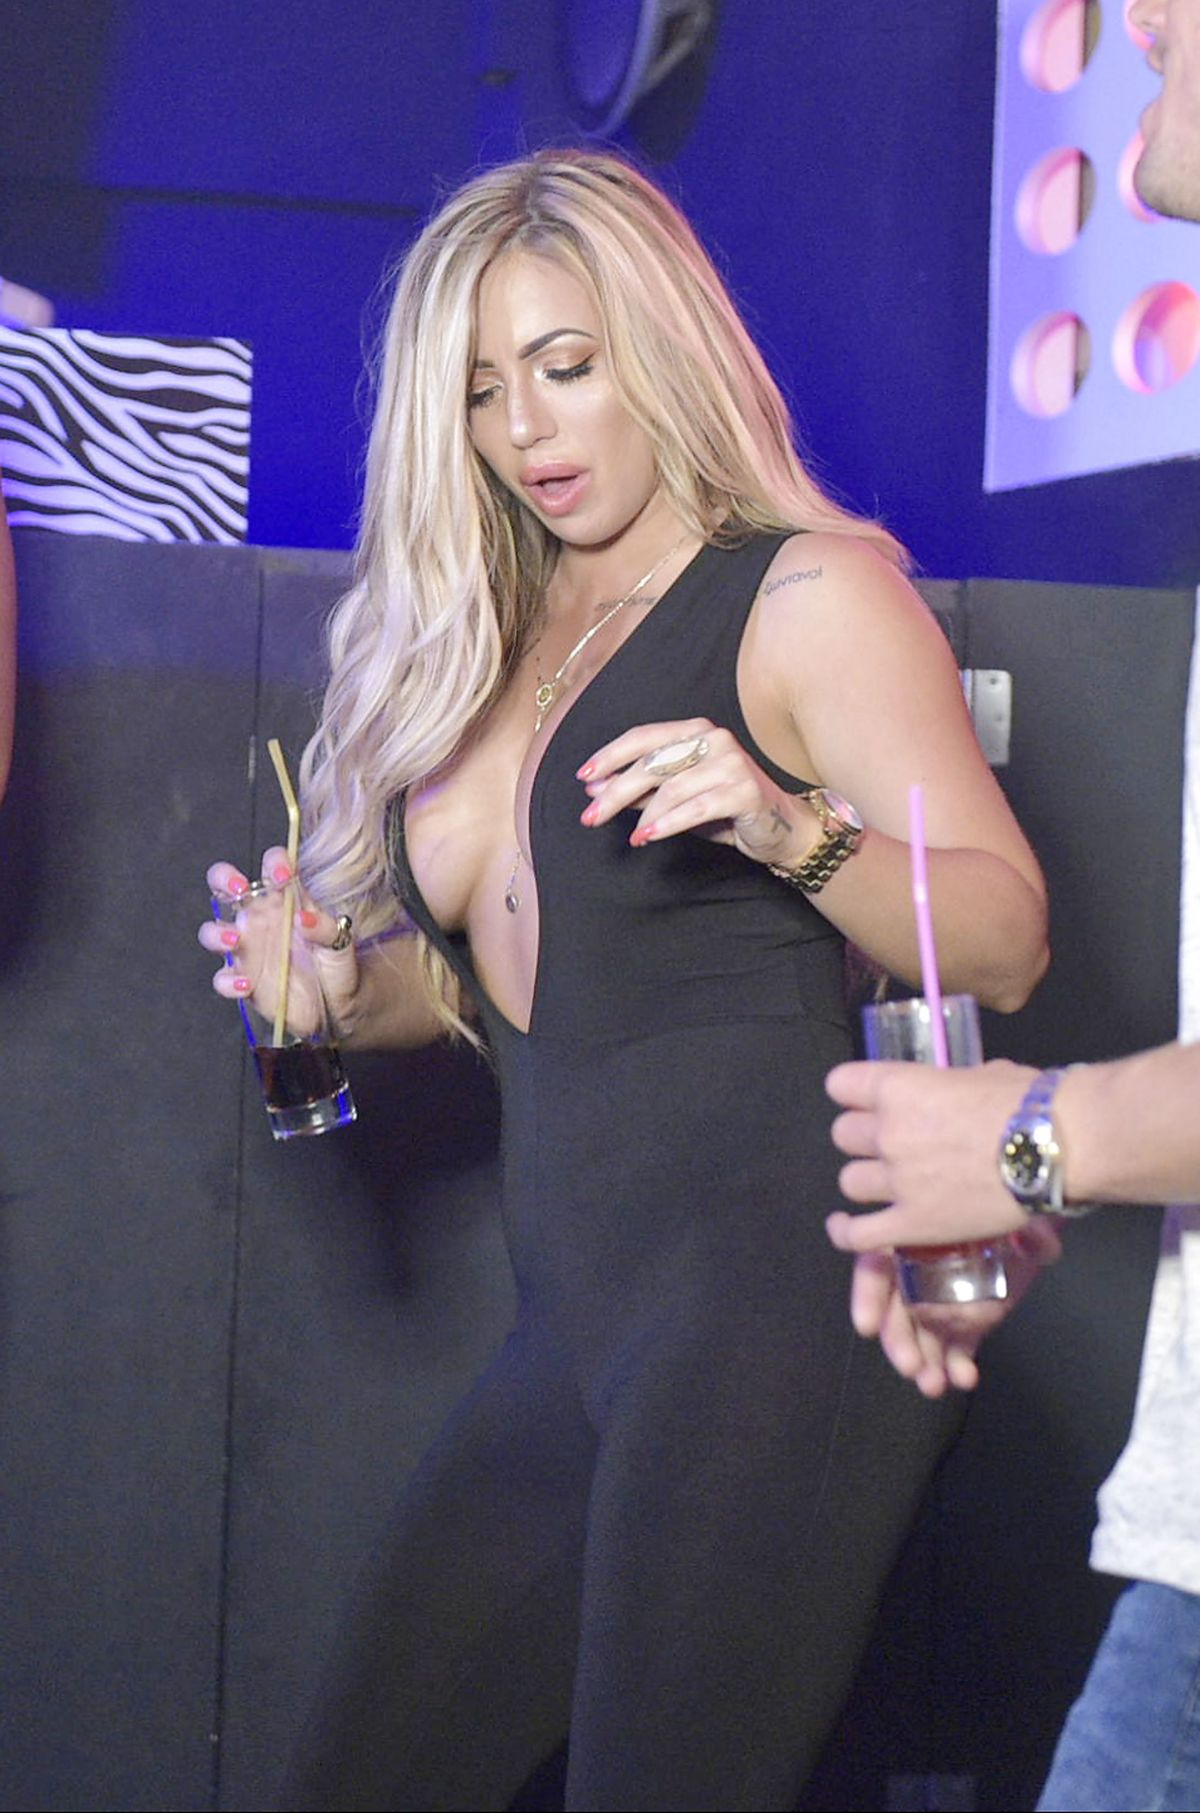 HOLLY HAGAN Filming at Sound Nightclub in Kavos in Greece 06/20/2016